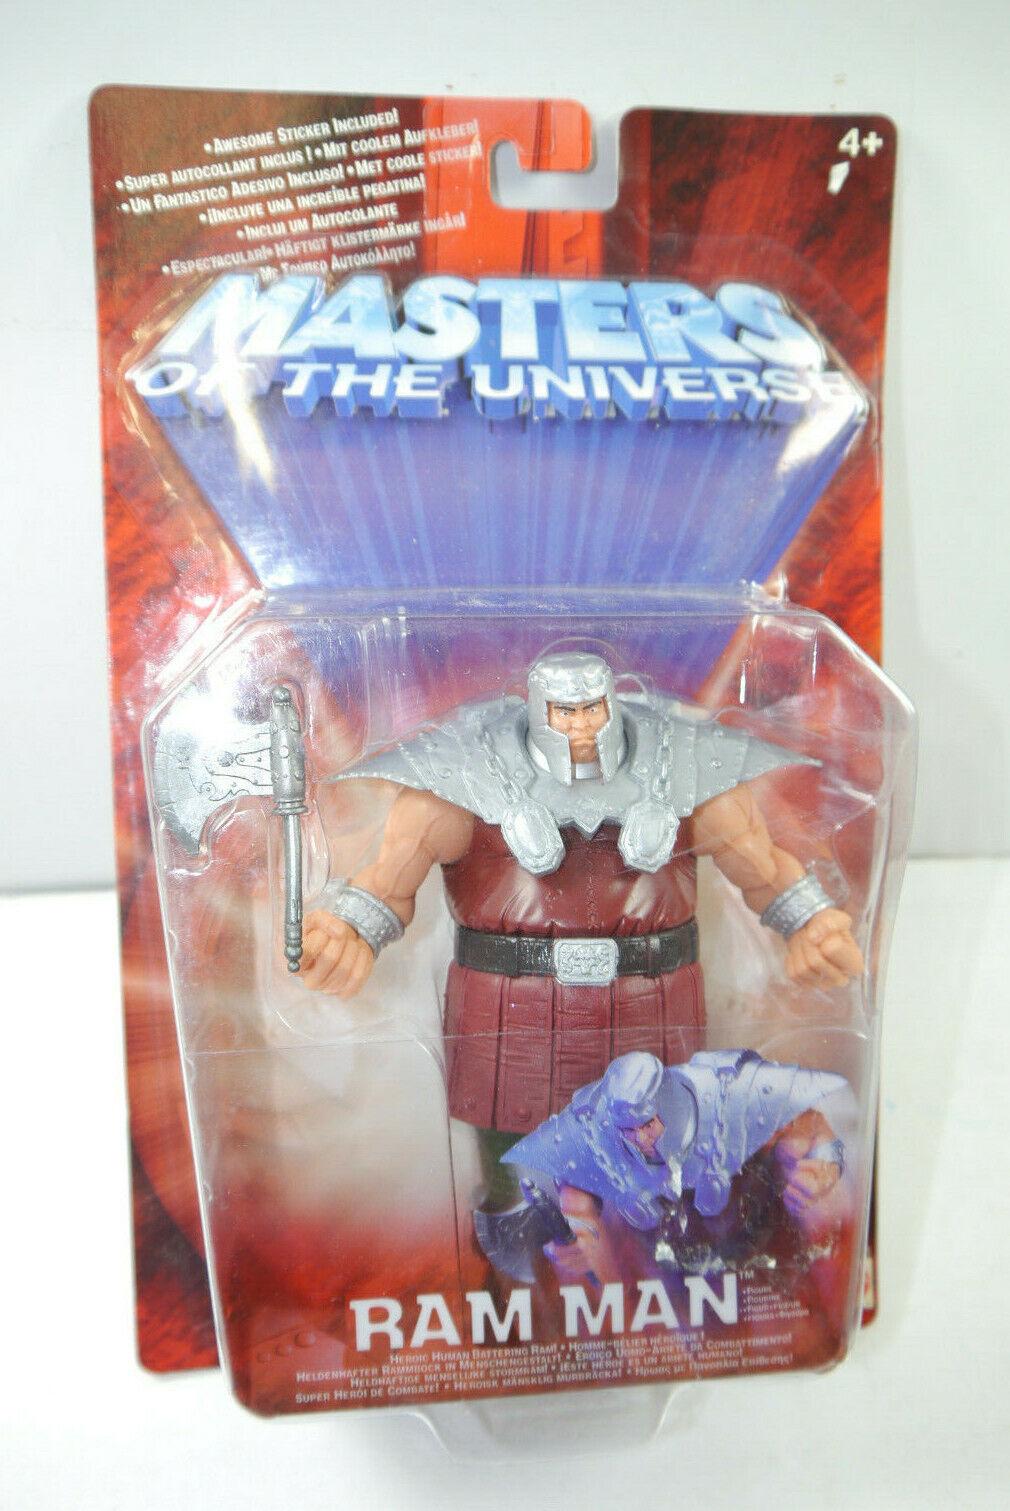 Masters of the Universe Motu 200x Ram Man Action Figure Mattel Approx. 15cm (L)